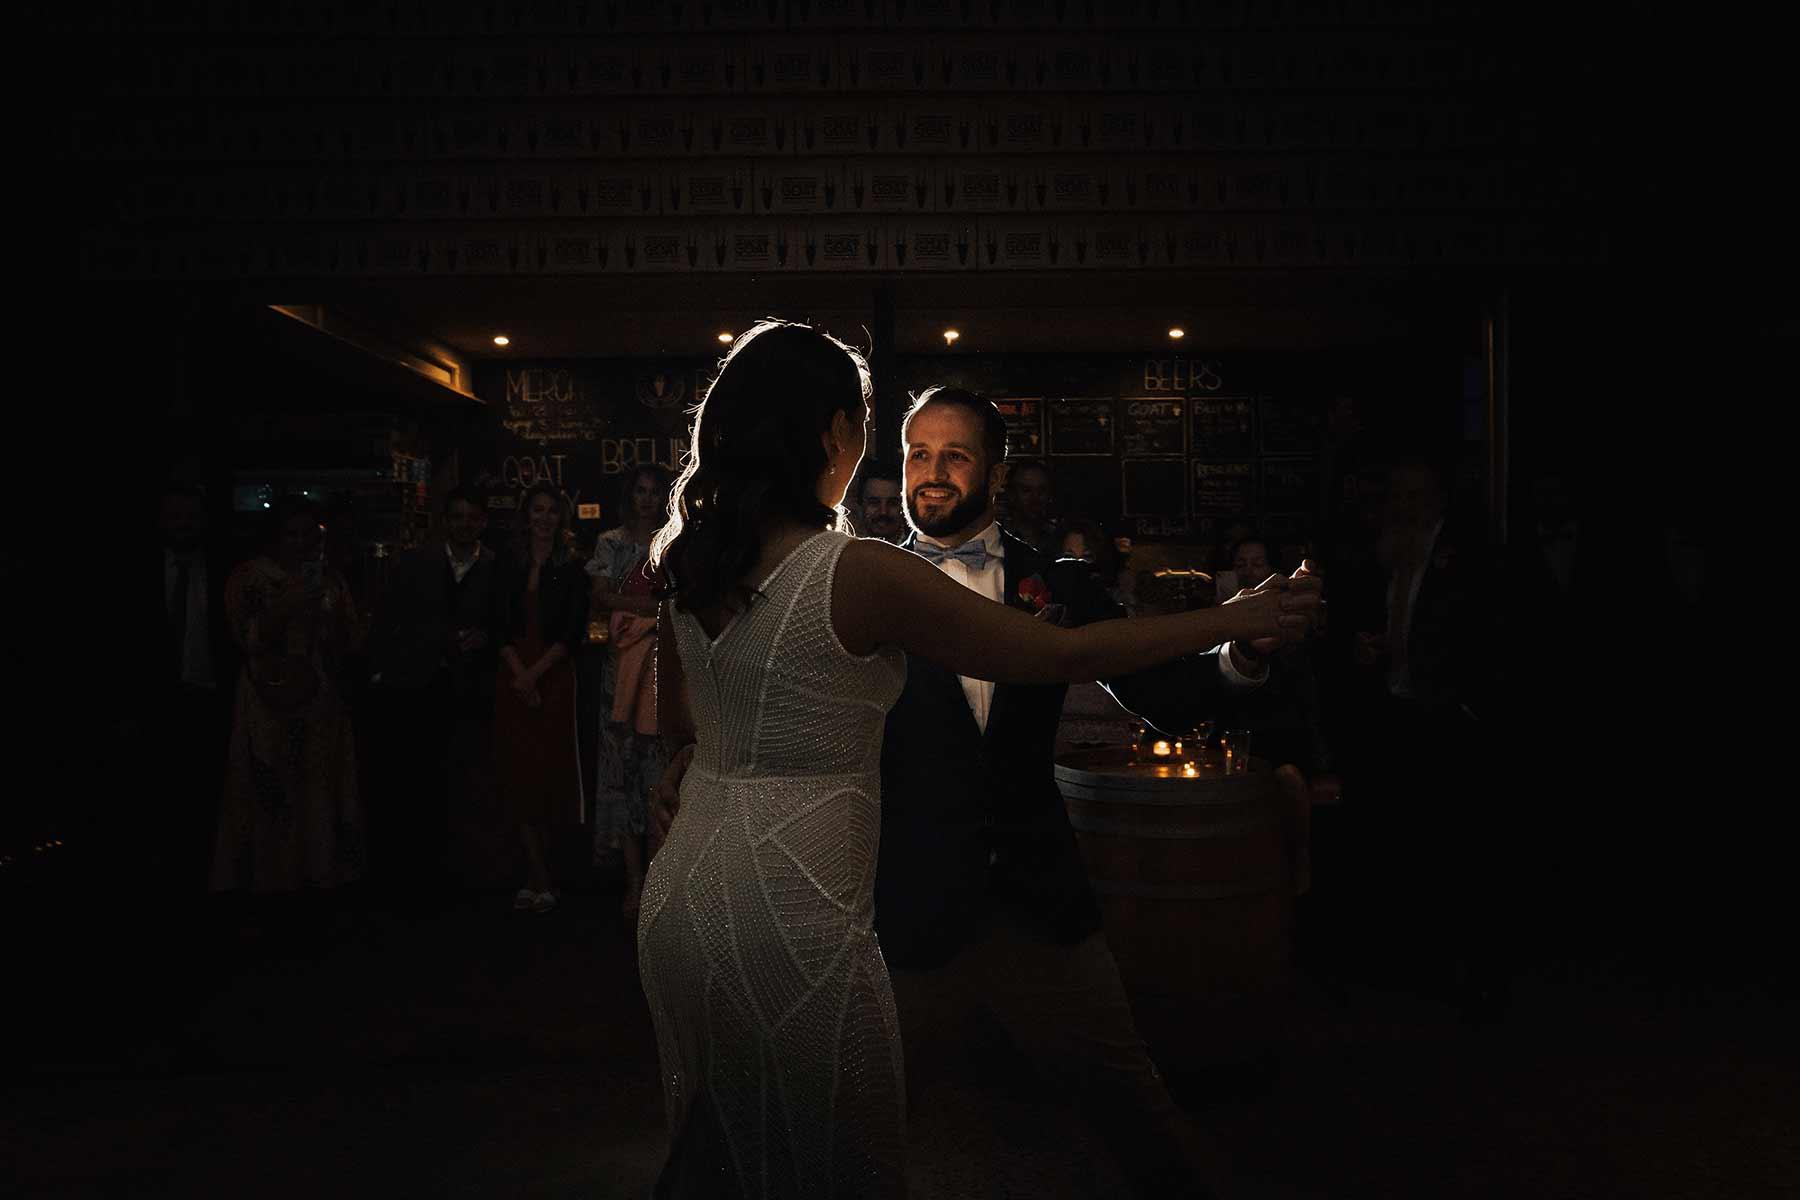 Melbourne wedding photographer Georgia Verrells